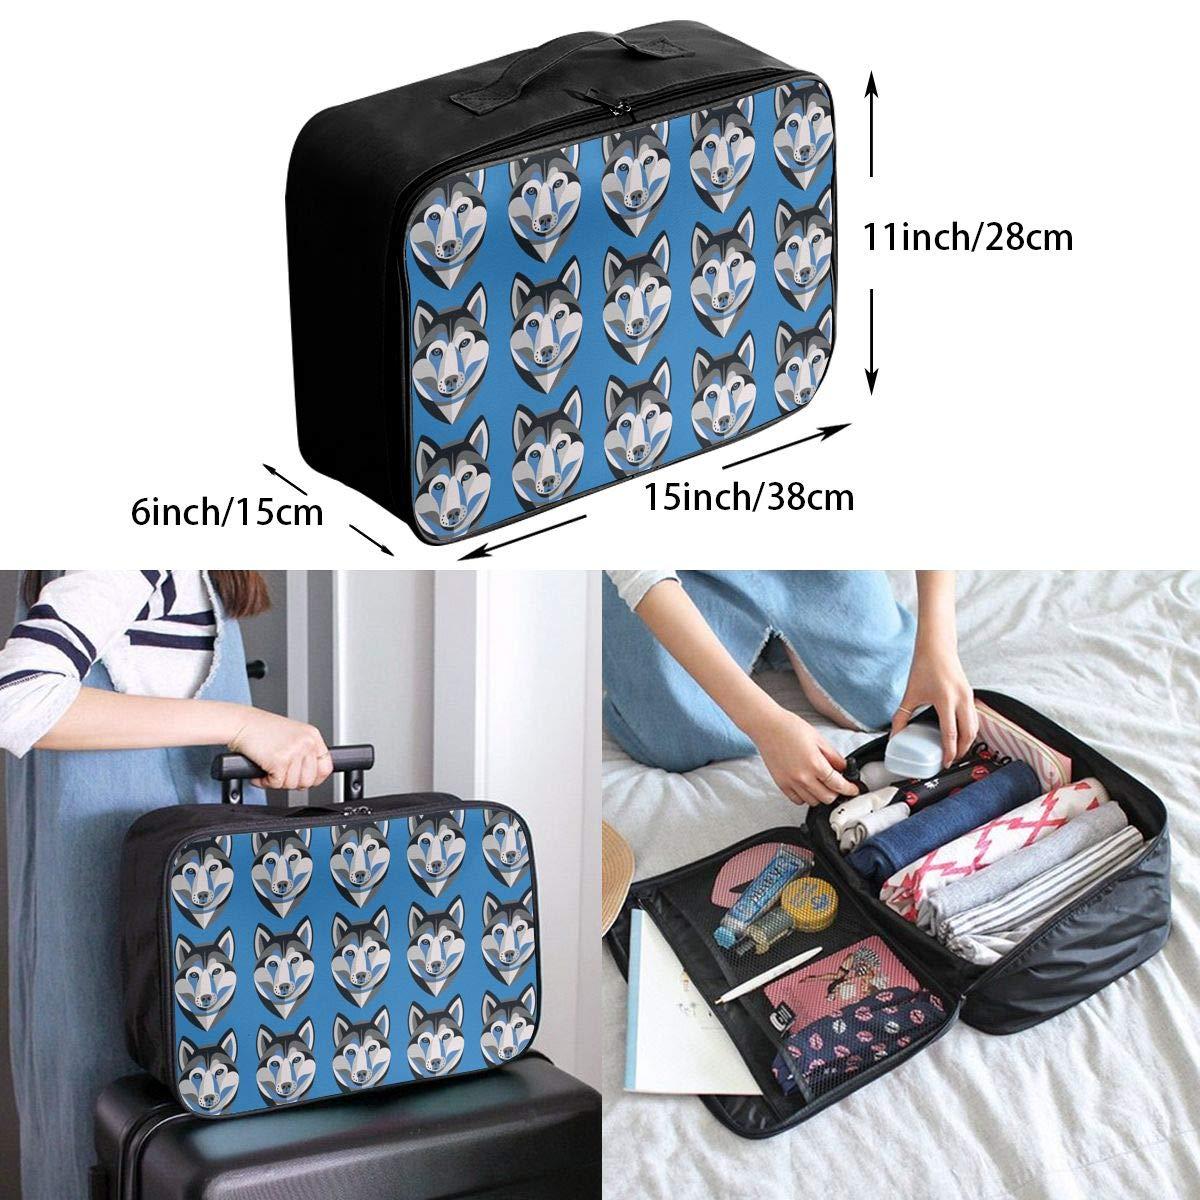 YueLJB Siberian Husky Pattern Lightweight Large Capacity Portable Luggage Bag Travel Duffel Bag Storage Carry Luggage Duffle Tote Bag